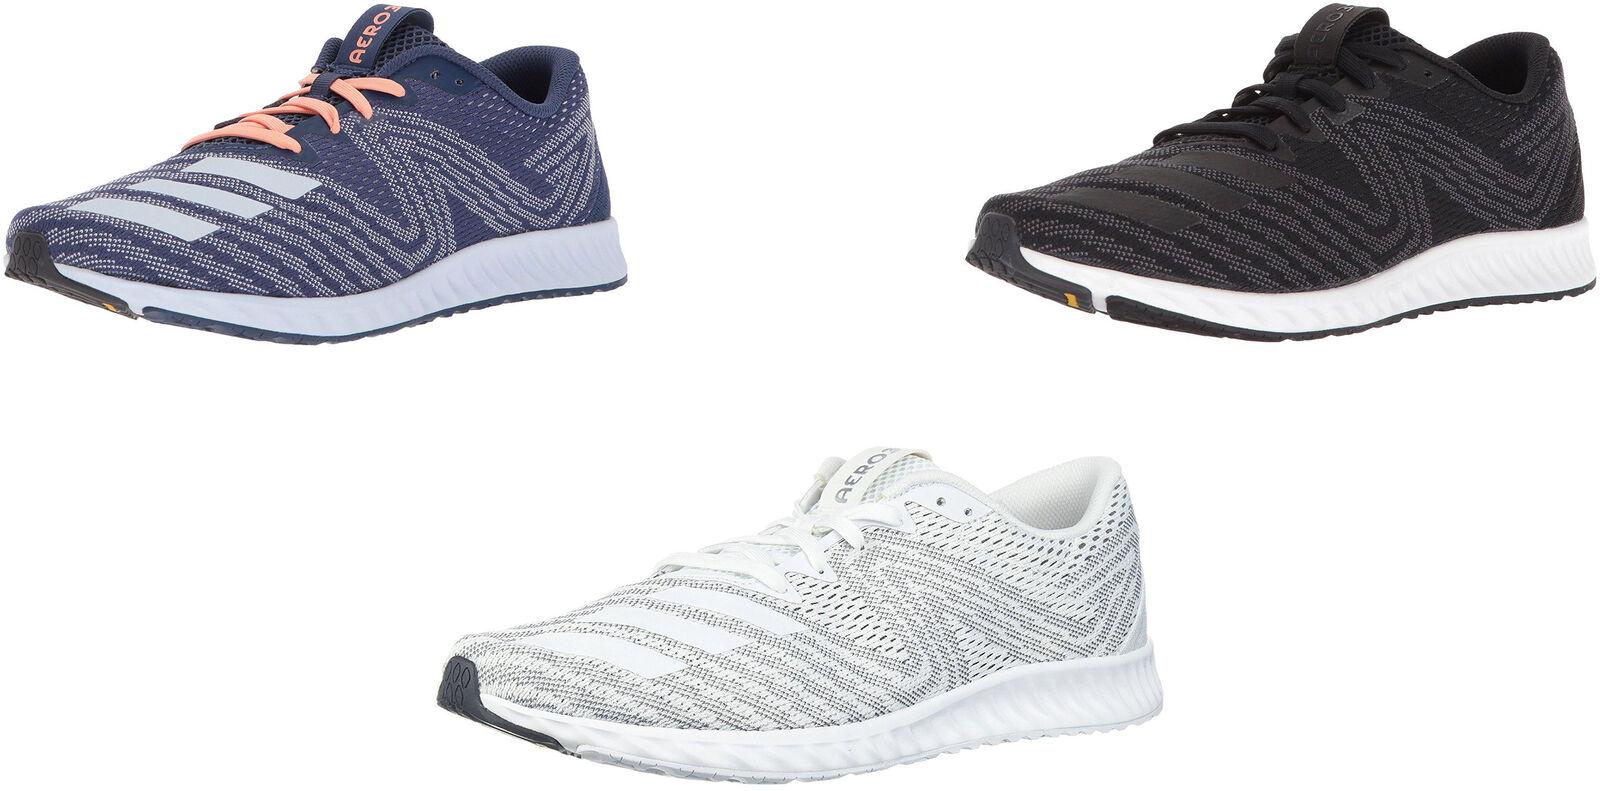 adidas Performance Women's Aerobounce PR Running Shoes, 3 Colors